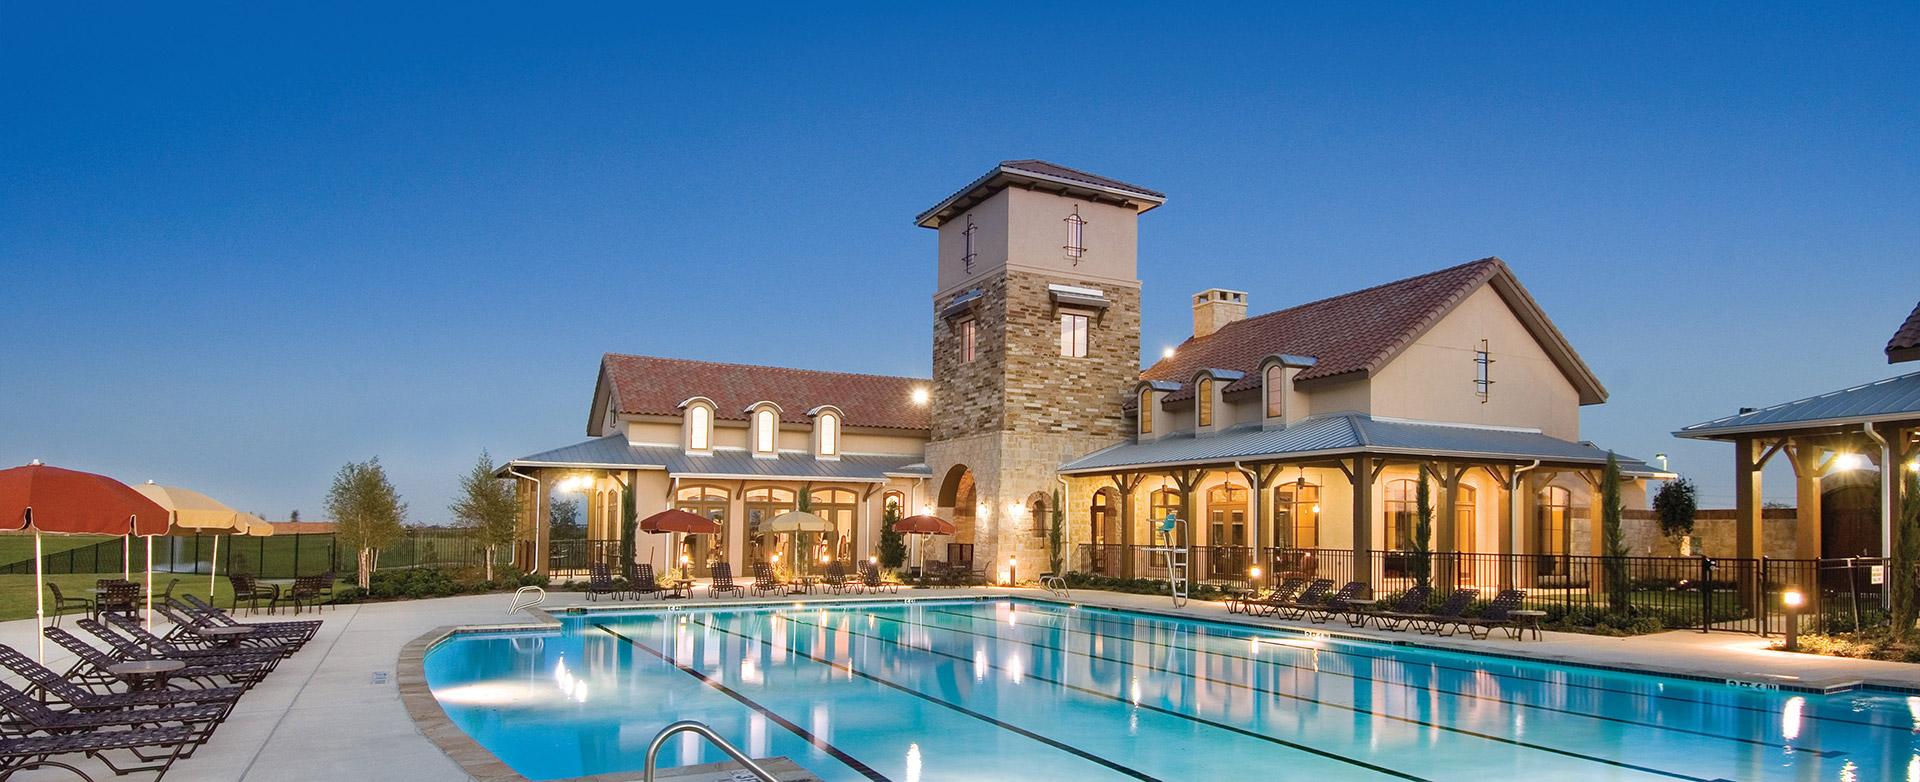 Resort style amenities and swimming pools of Bella Terra